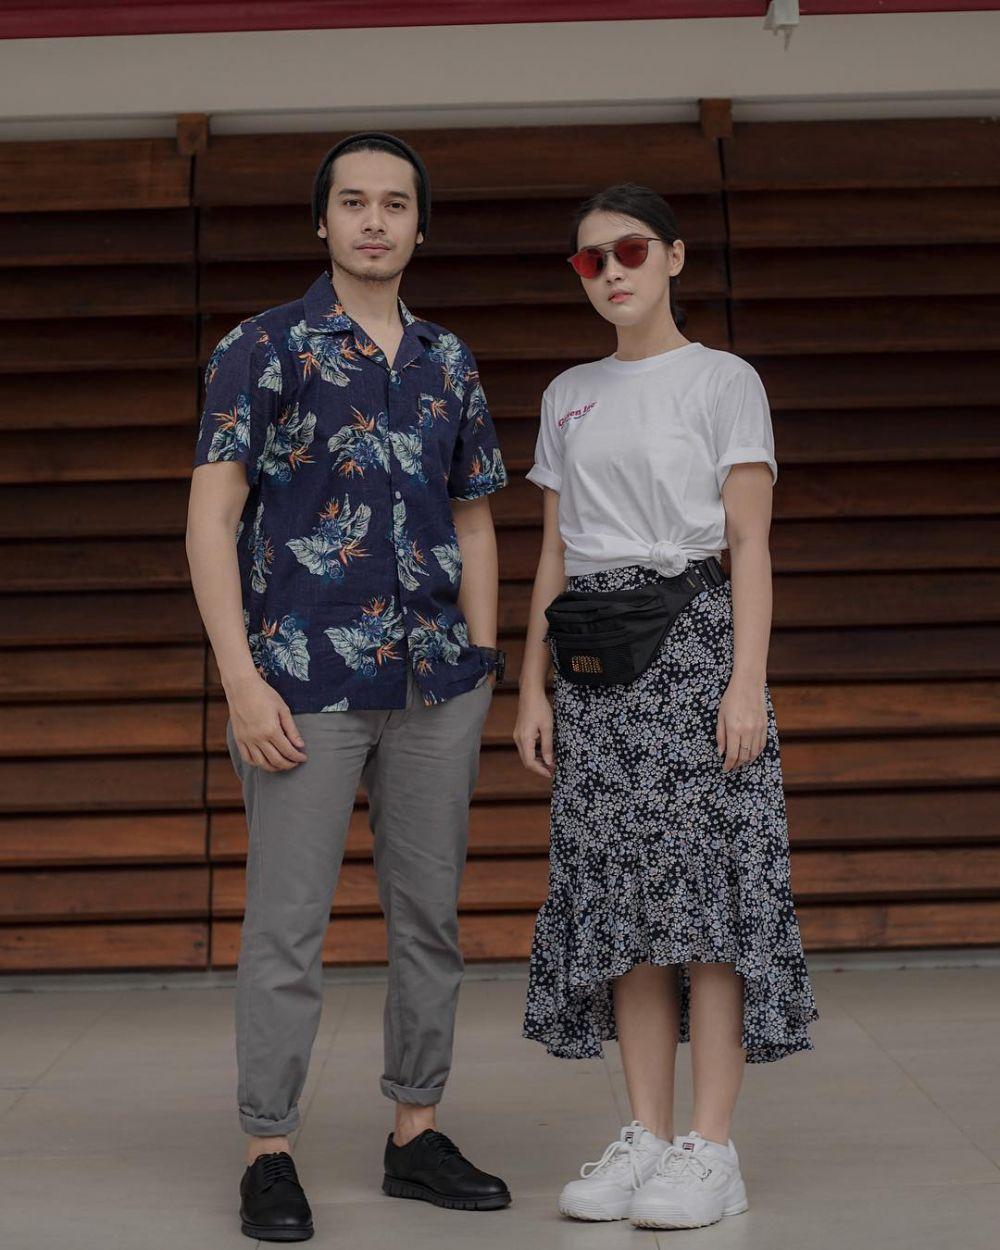 Ana Riana dan pacar nyata Willy instagram